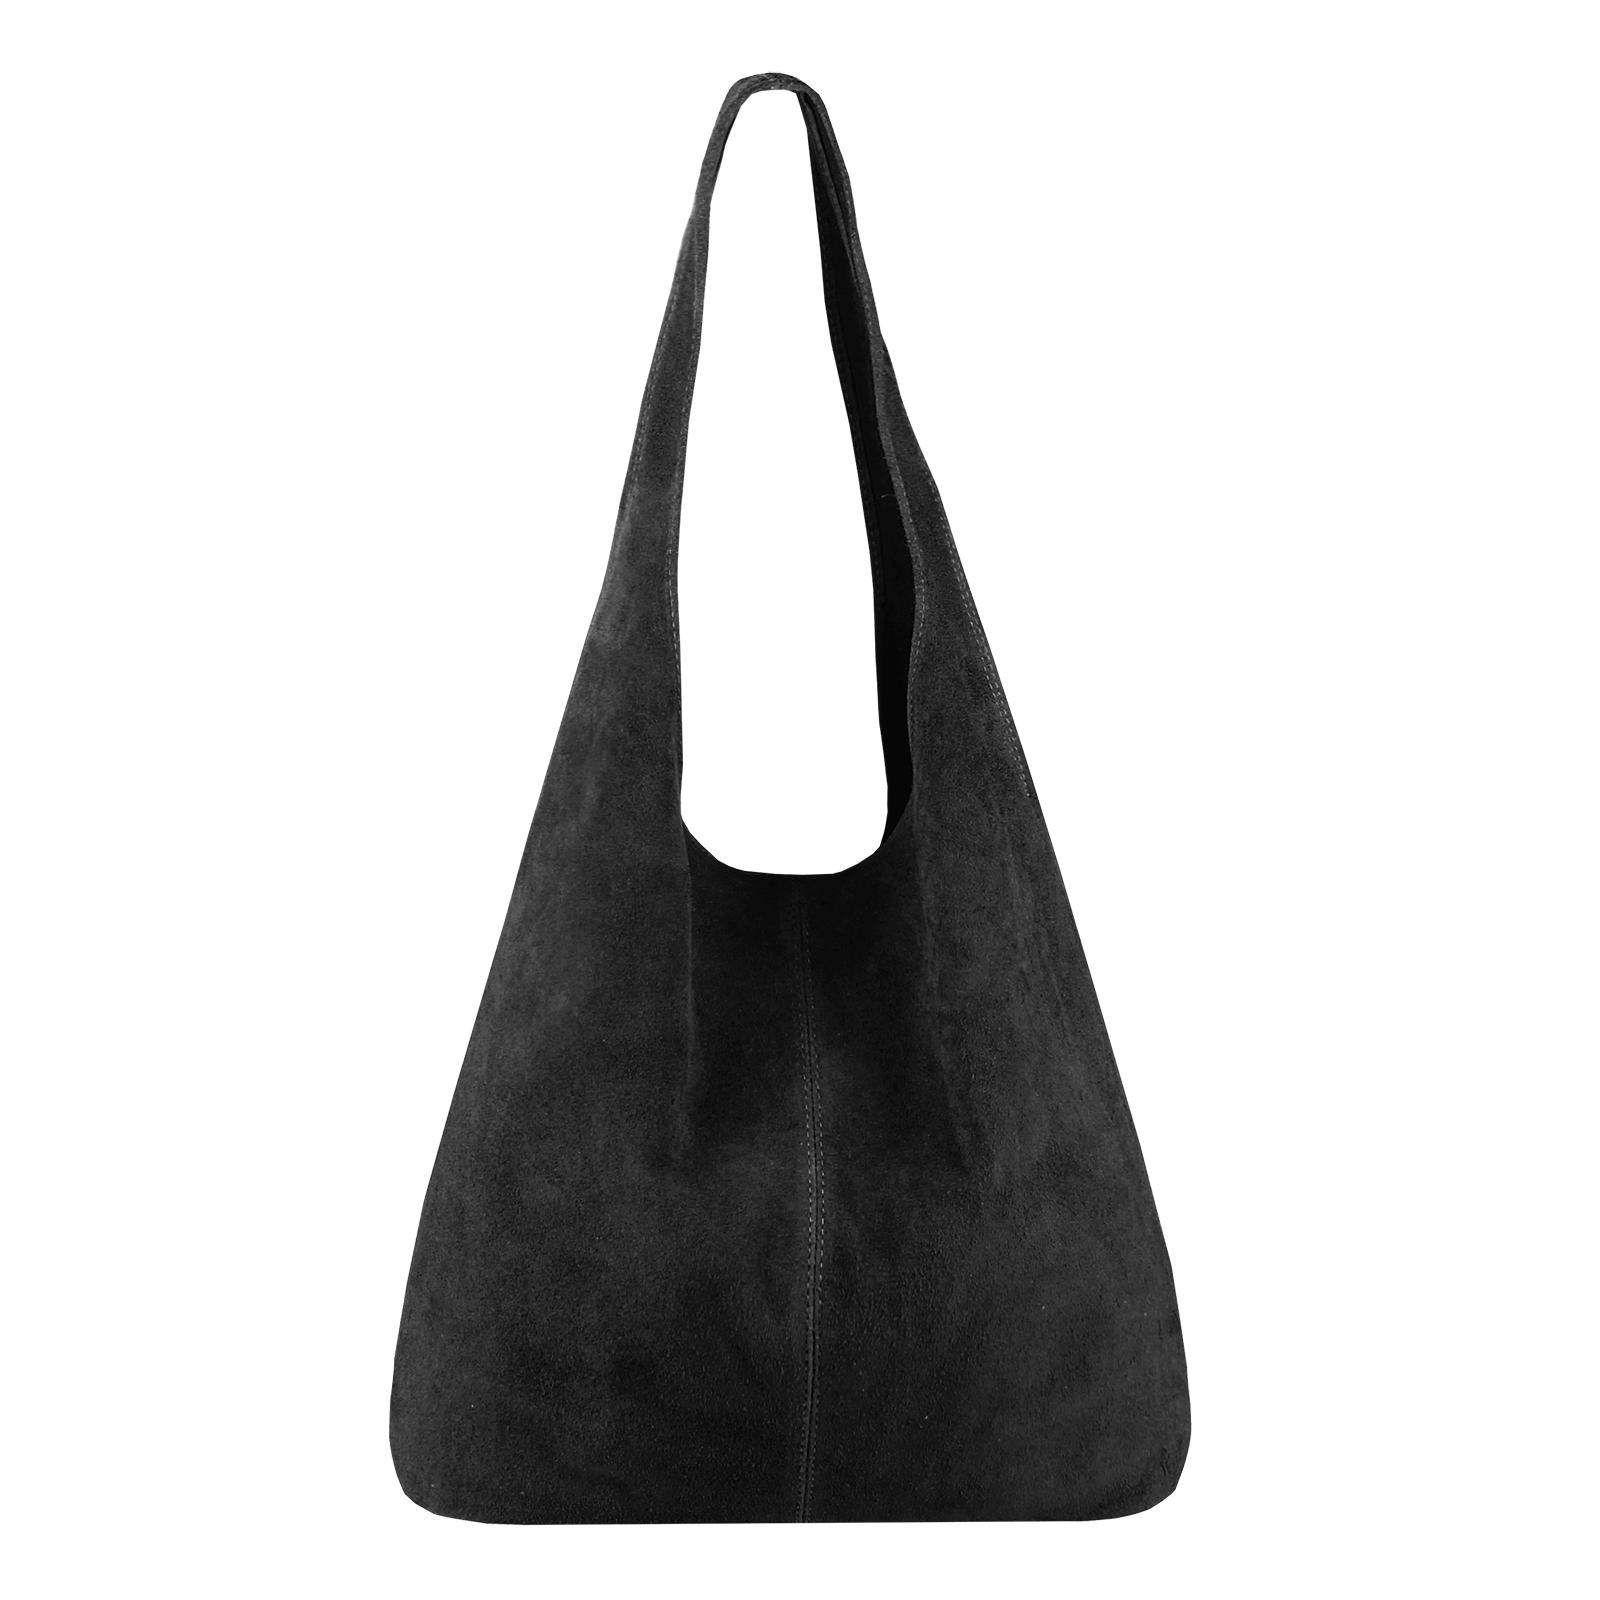 4e9583aac81c5 MADE IN ITALY DAMEN LEDER TASCHE Handtasche Wildleder Shopper  Schultertasche Hobo-Bag Henkeltasche Beuteltasche Velourleder